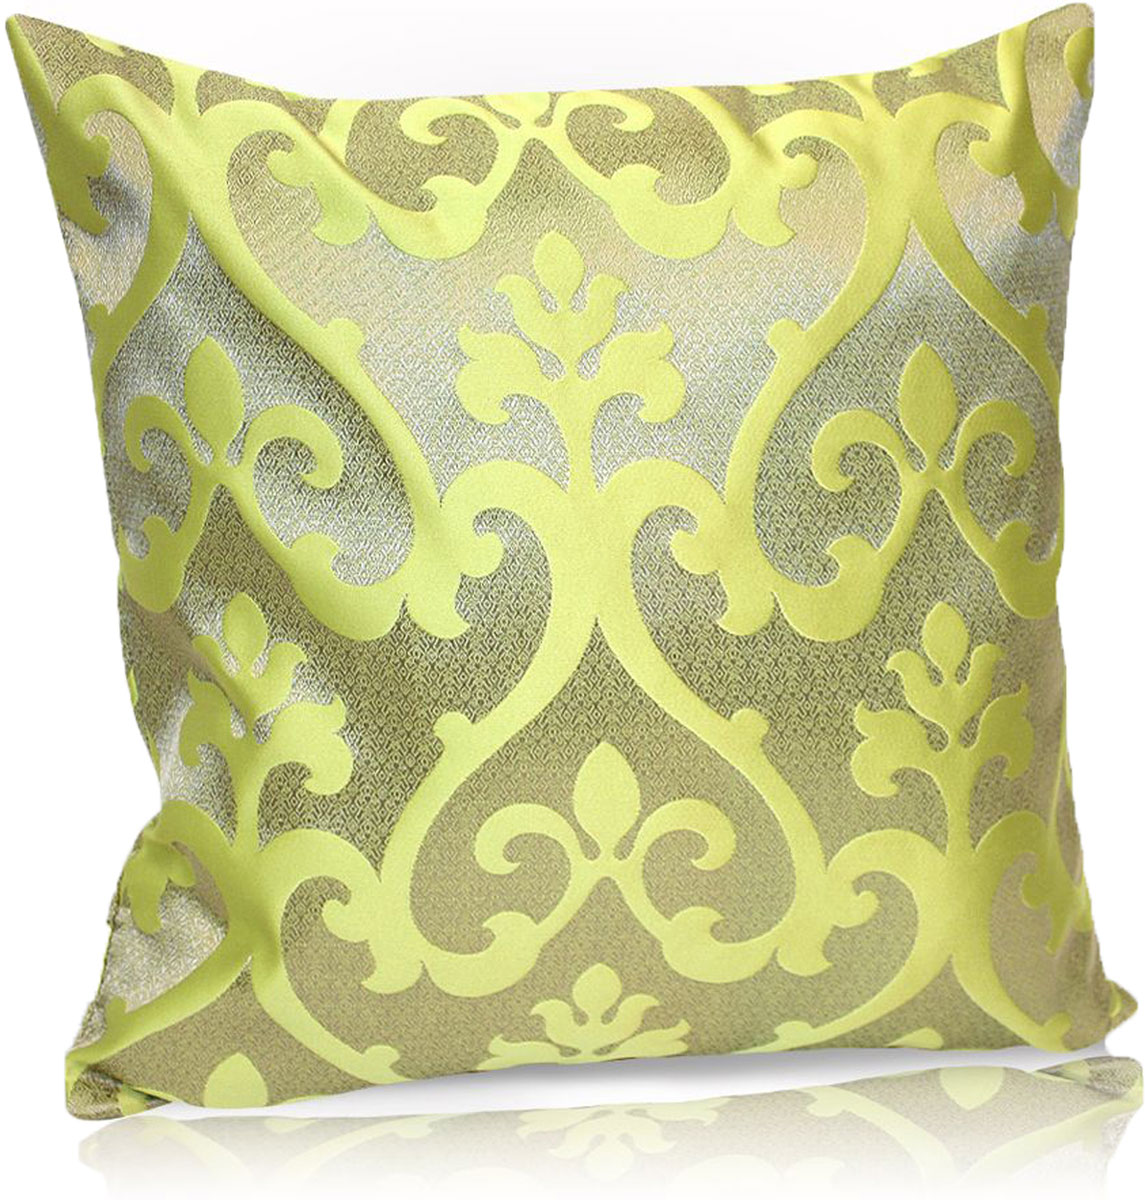 Подушка декоративная KauffOrt Флорентина, цвет: оливковый, 40 x 40 см штора легкая kauffort barolo